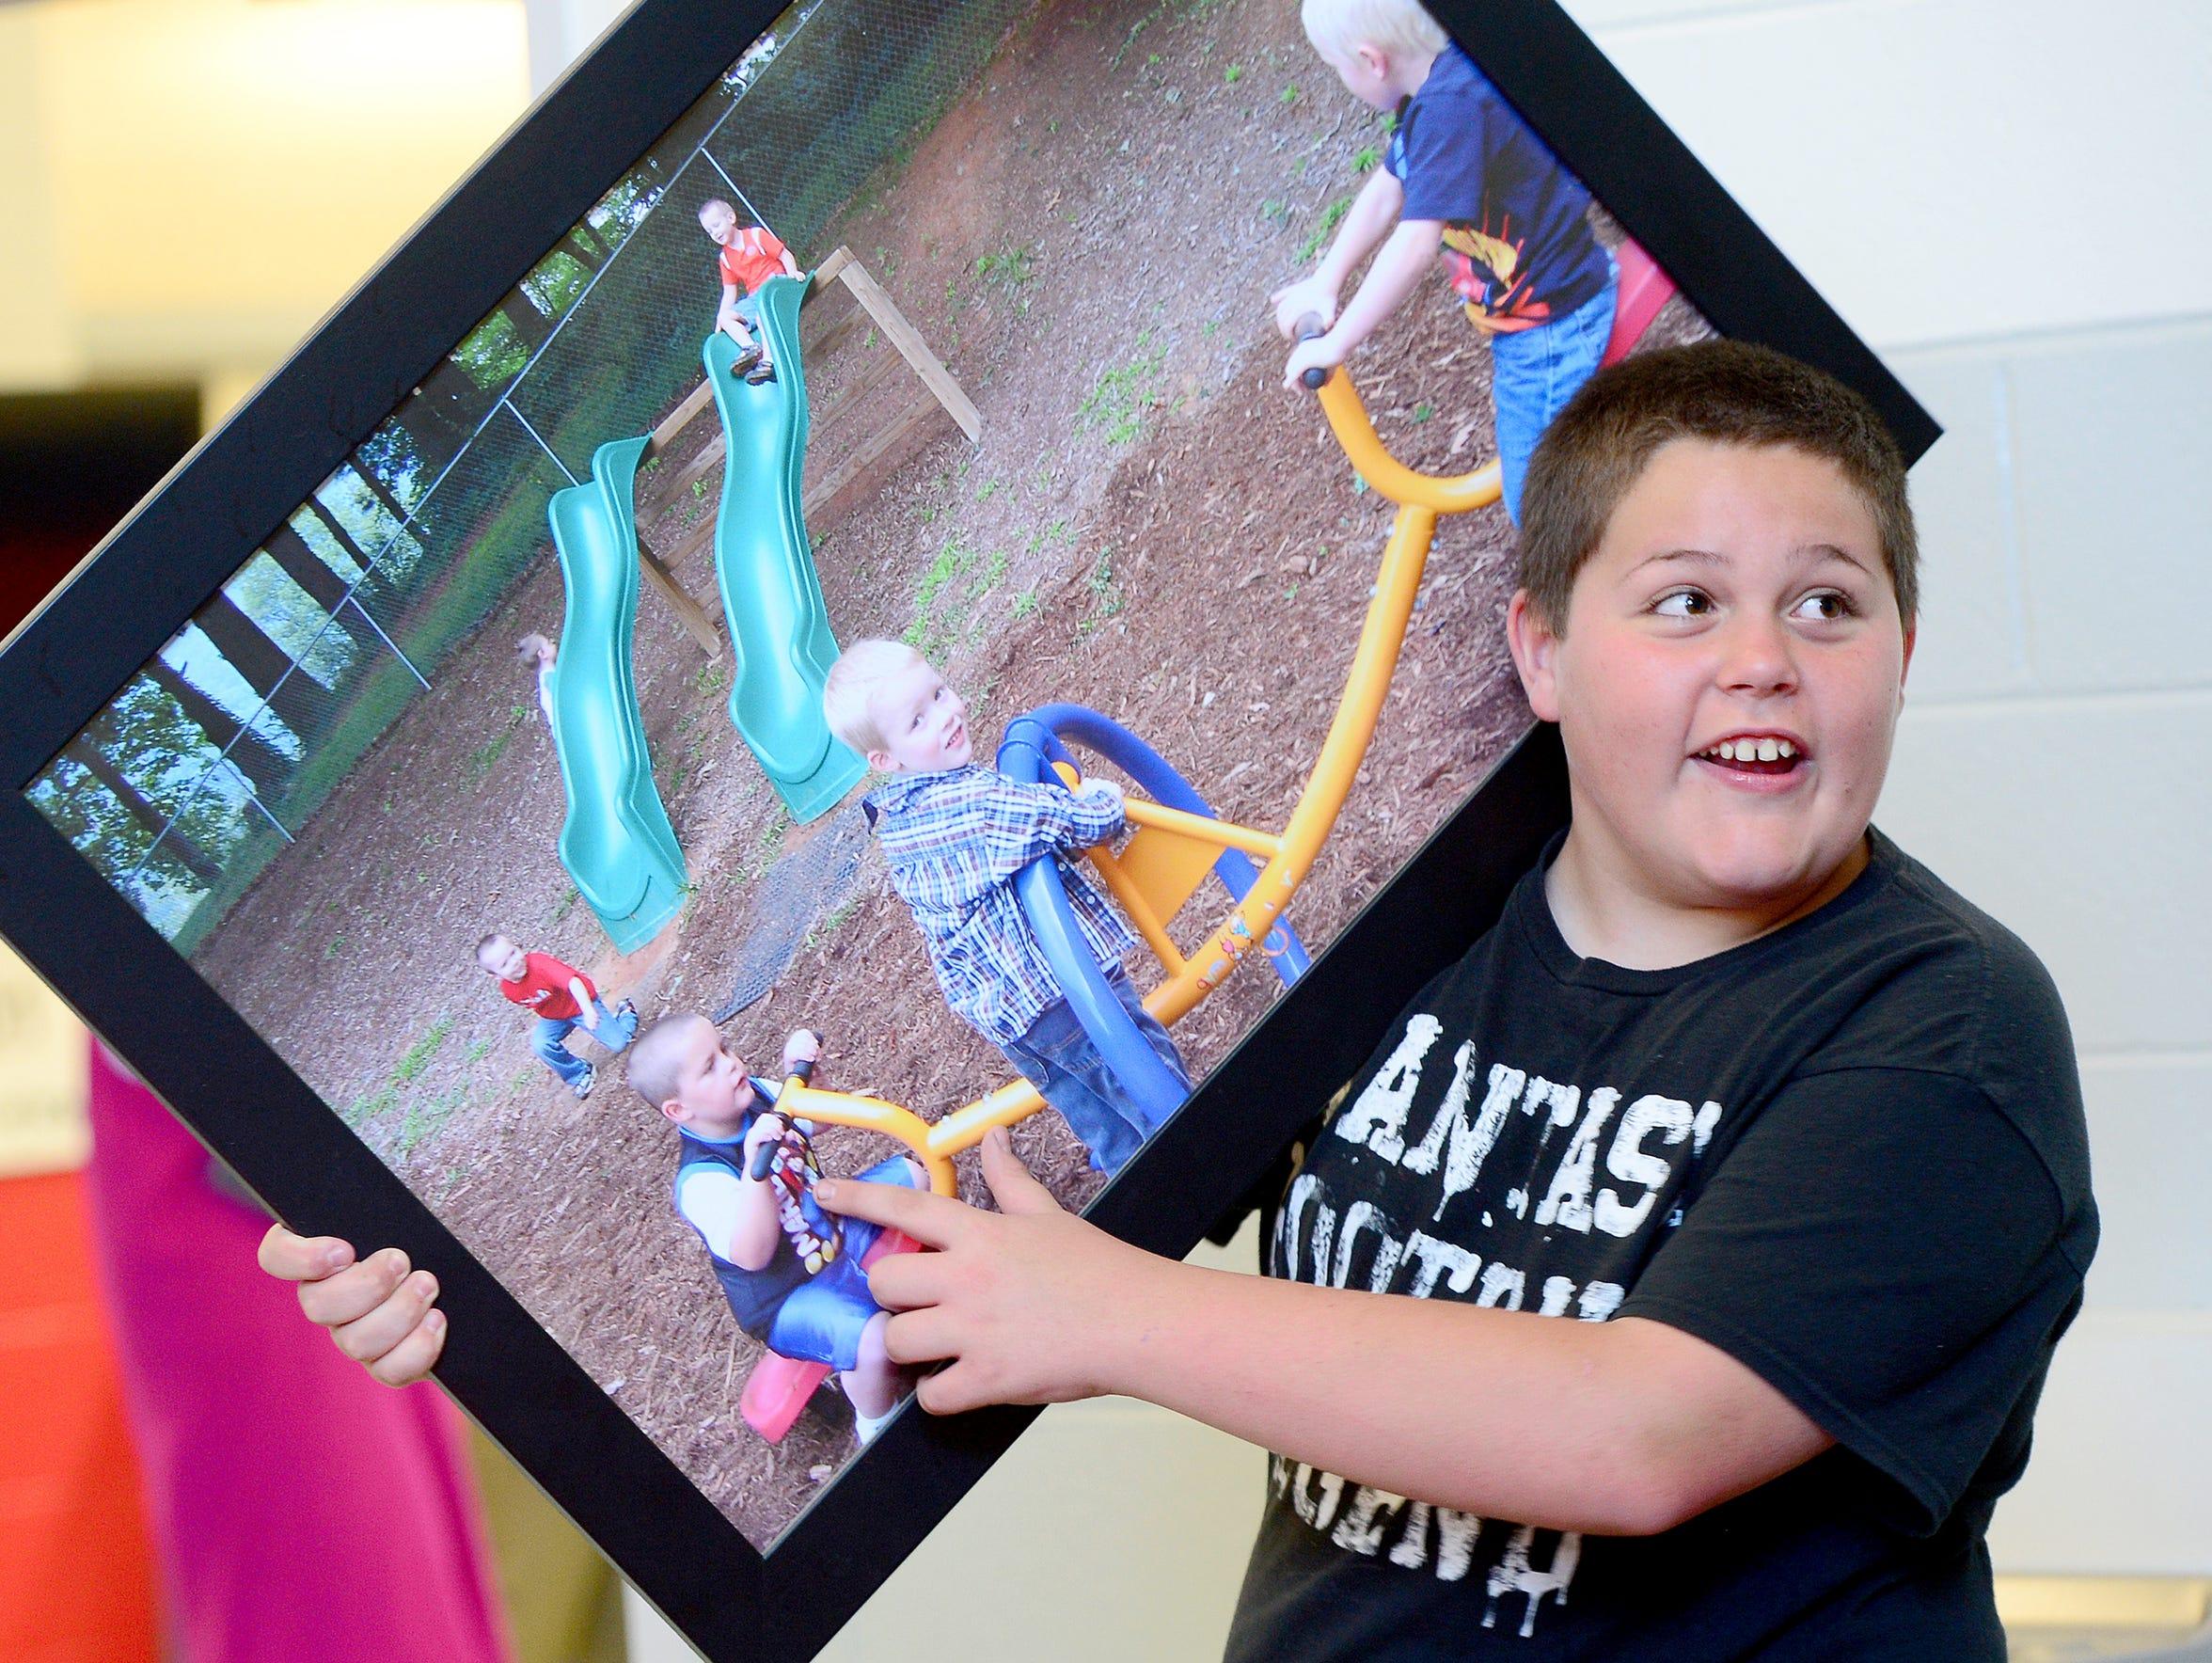 Central Elementary School fifth-grader Jacob Rhinehart,